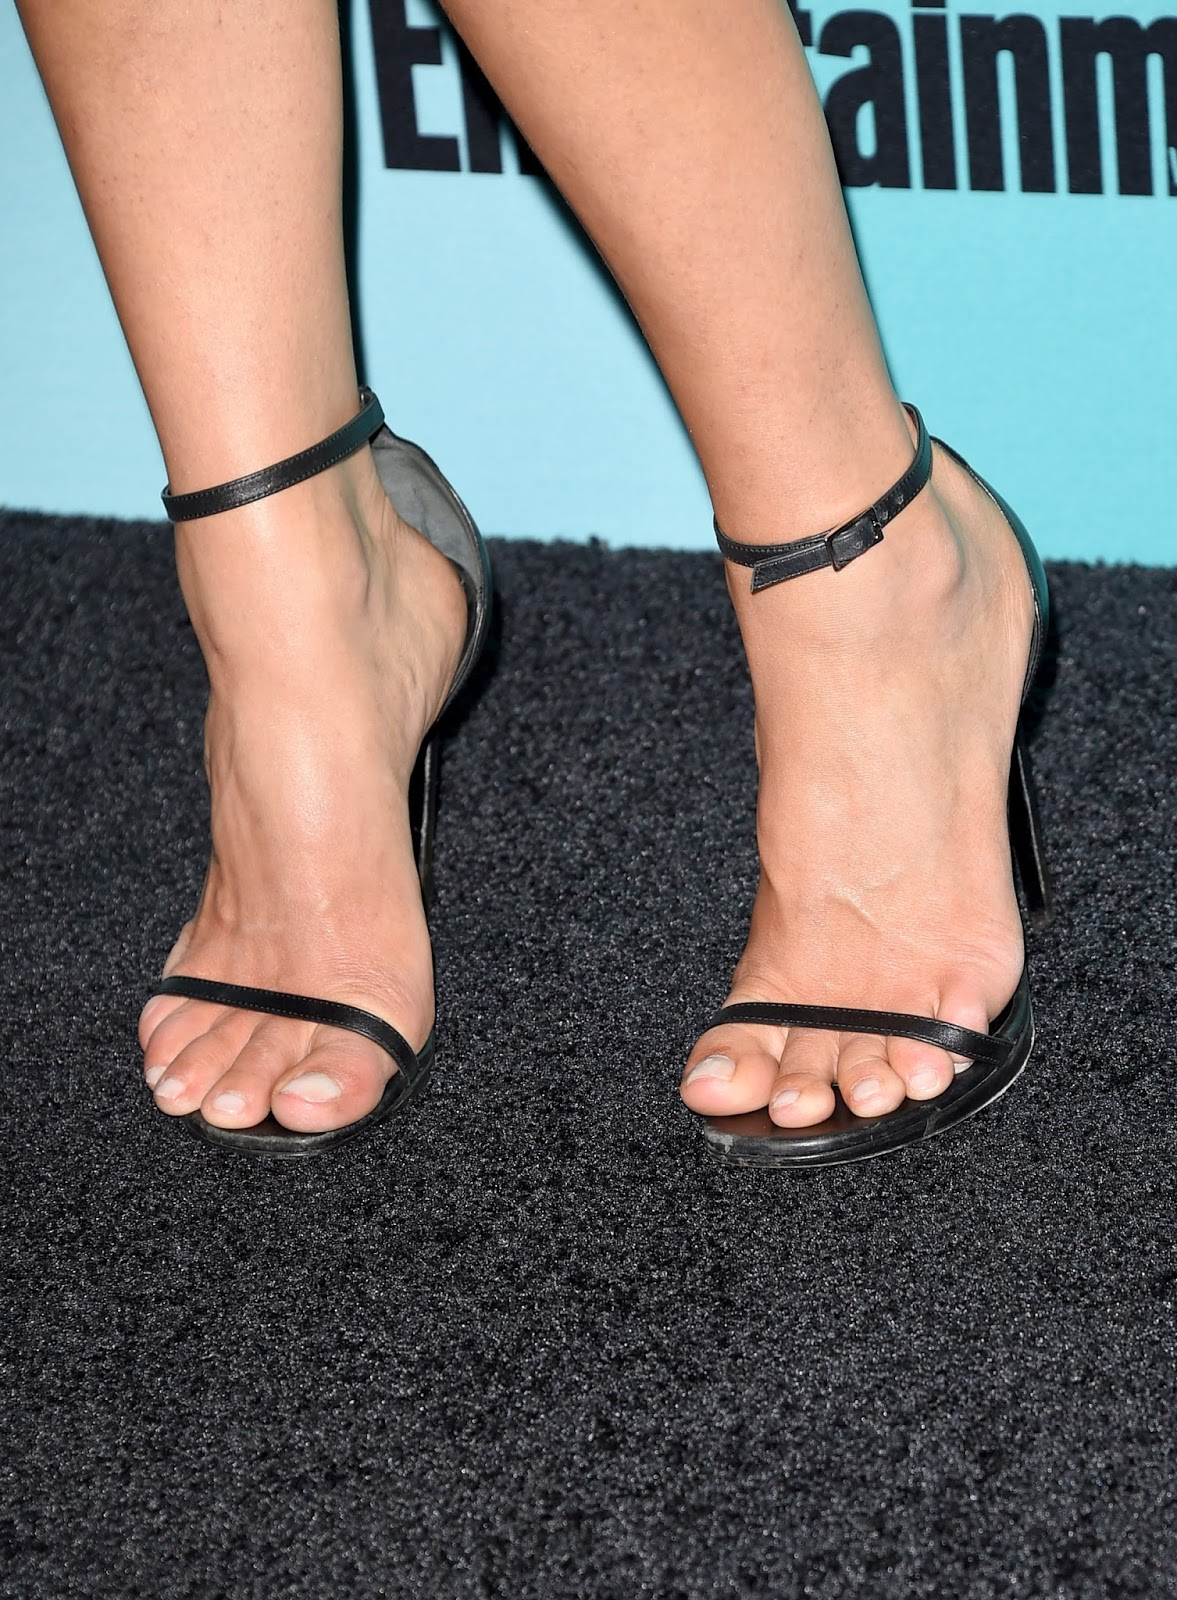 Feet Phoebe Price nude photos 2019